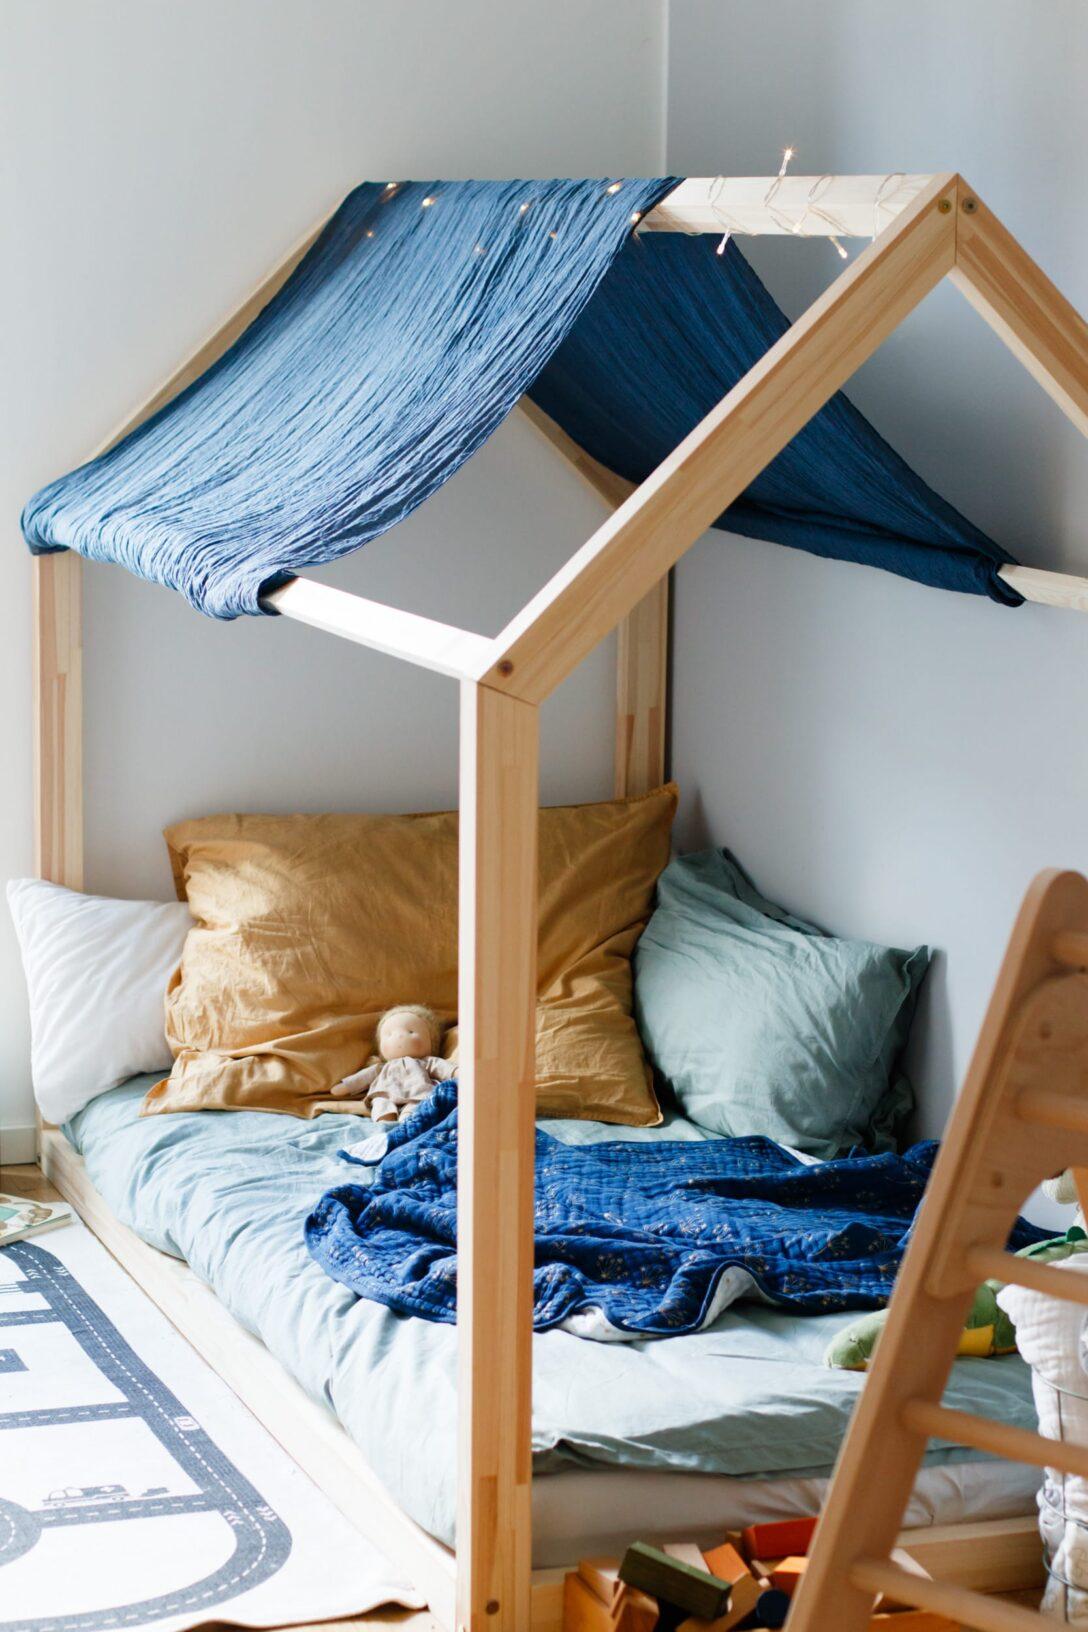 Large Size of Kinderbett Diy Rausfallschutz Bett Hausbett Ikea Obi Haus Kinderbetten Anleitung Fr Floor Bed Nach Maria Montessori Wohnzimmer Kinderbett Diy